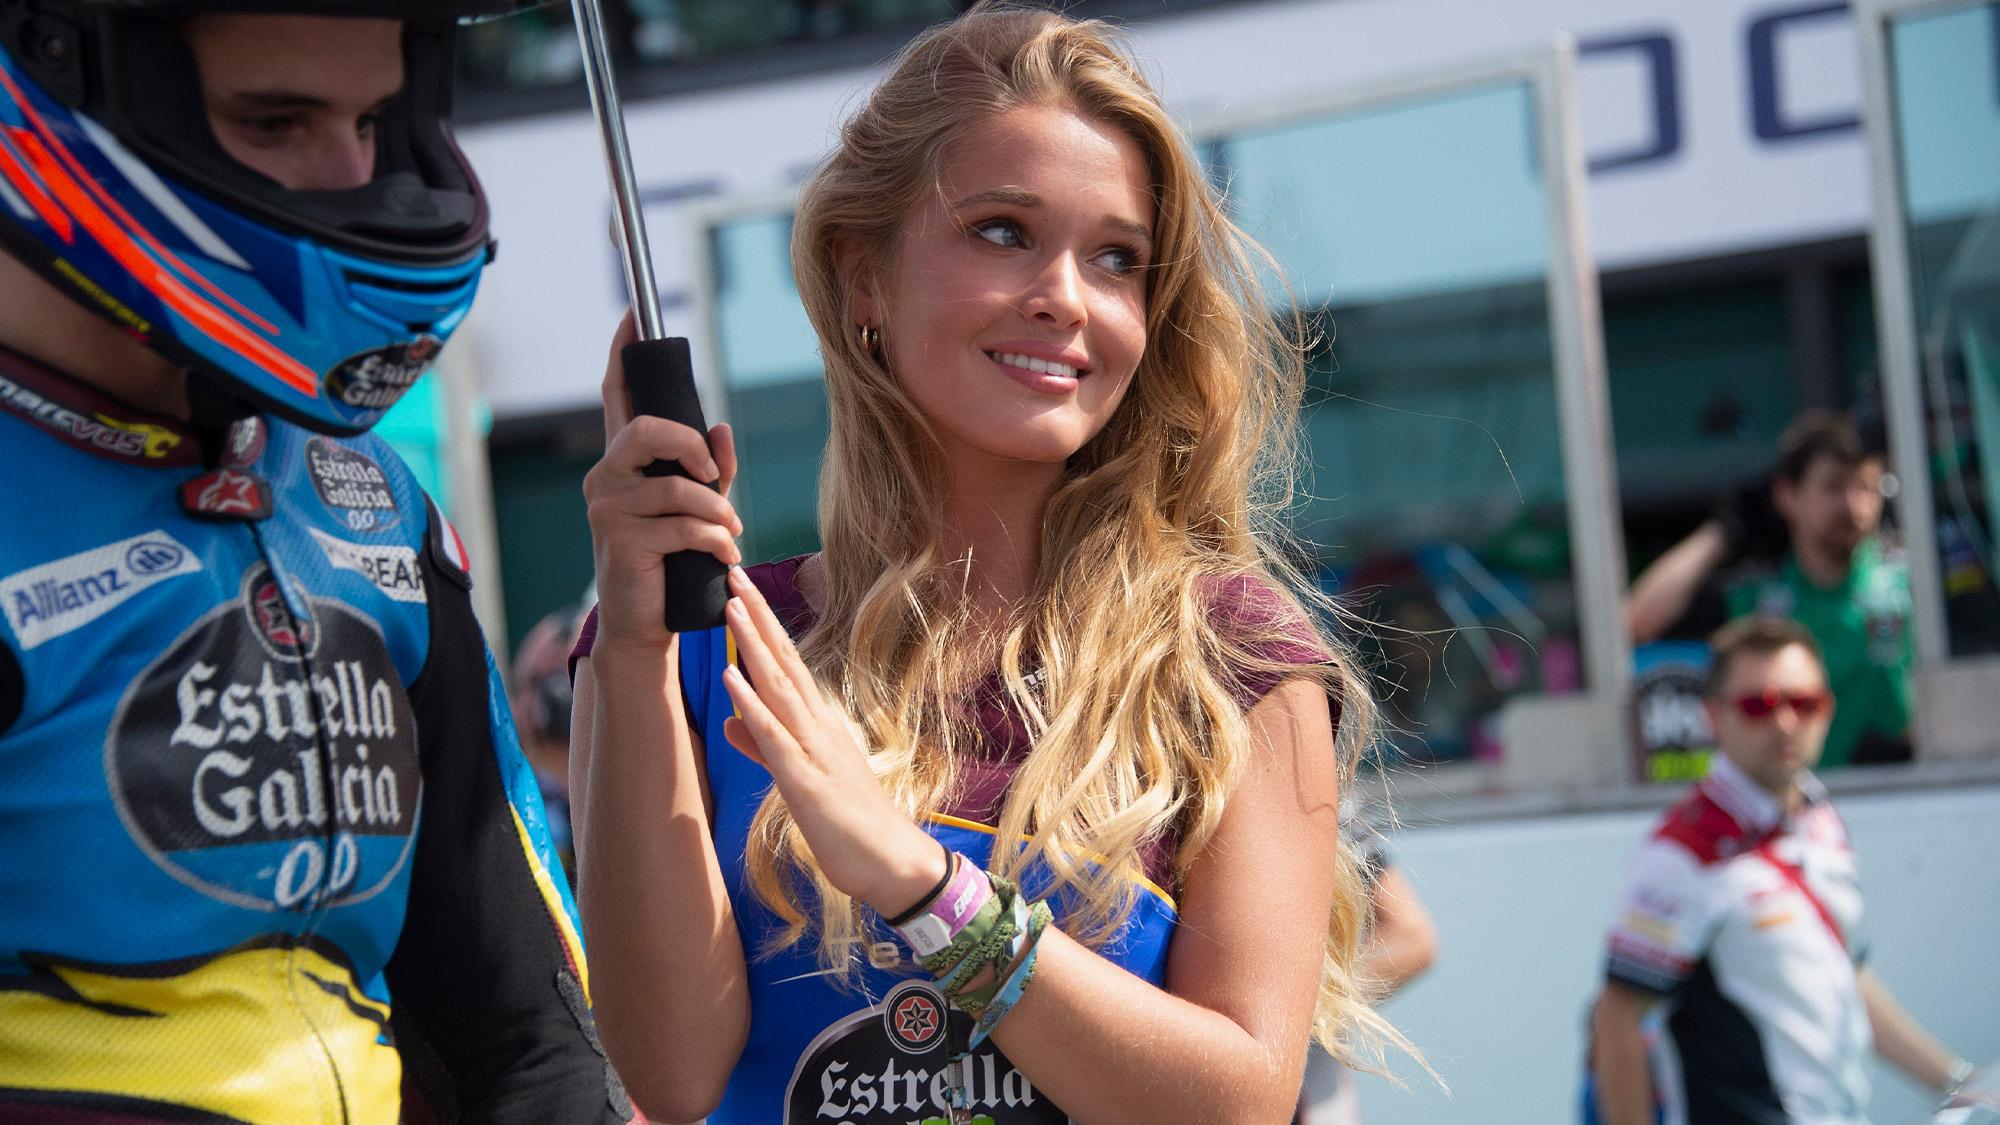 Grid girl holding an umbrella ahead of the 2019 MotoGP San Marino Grand Prix at Misano